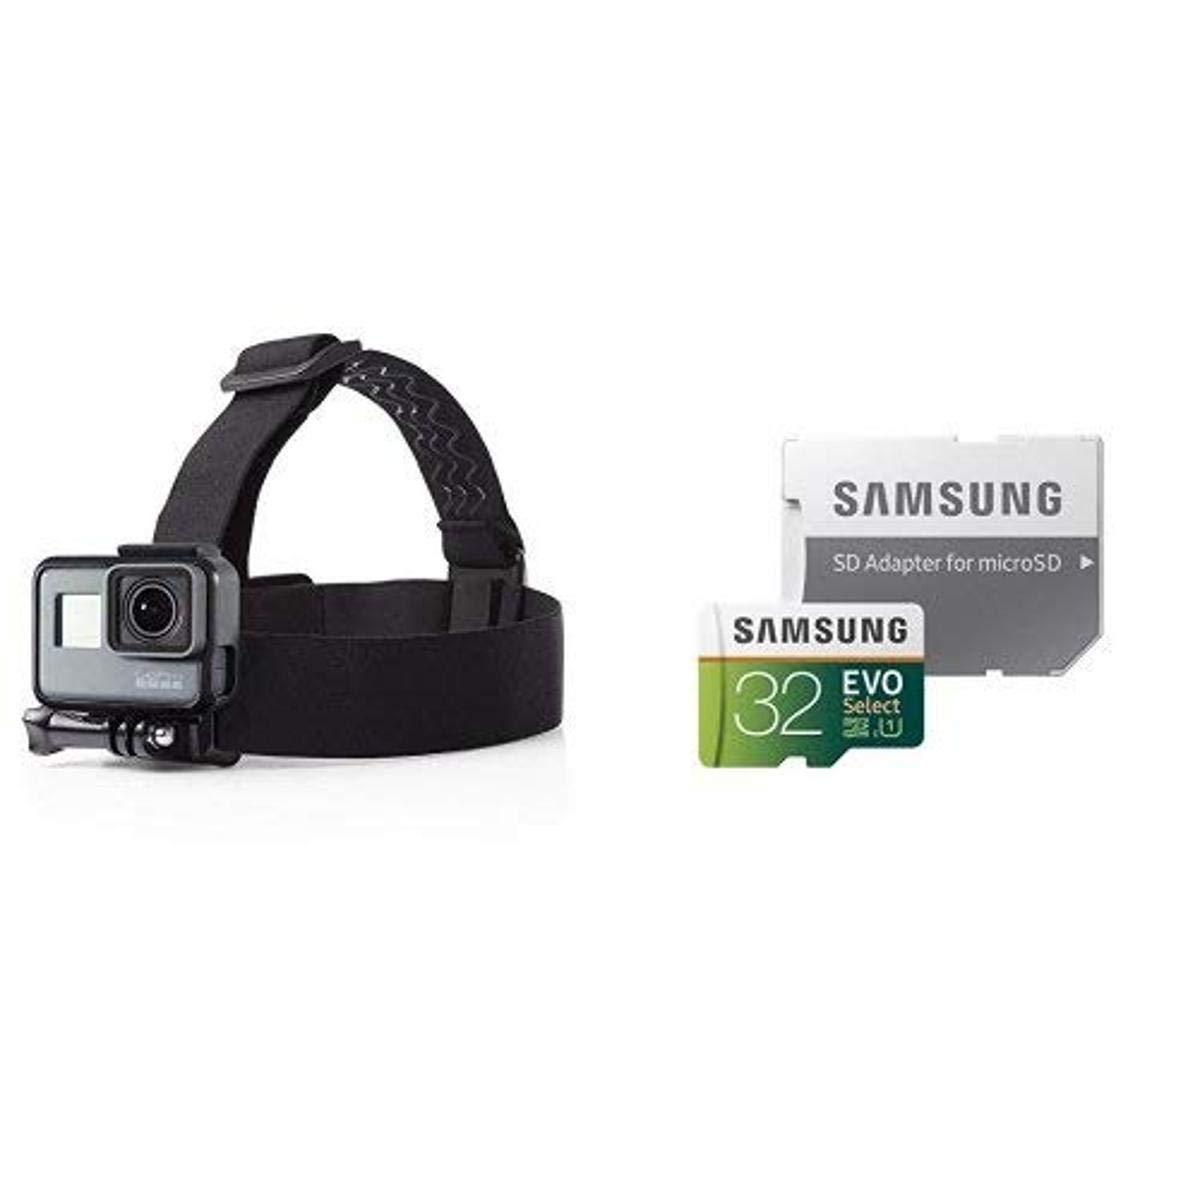 AmazonBasics Head Strap Camera Mount for GoPro and Samsung 32GB 95MB/s (U1) MicroSD